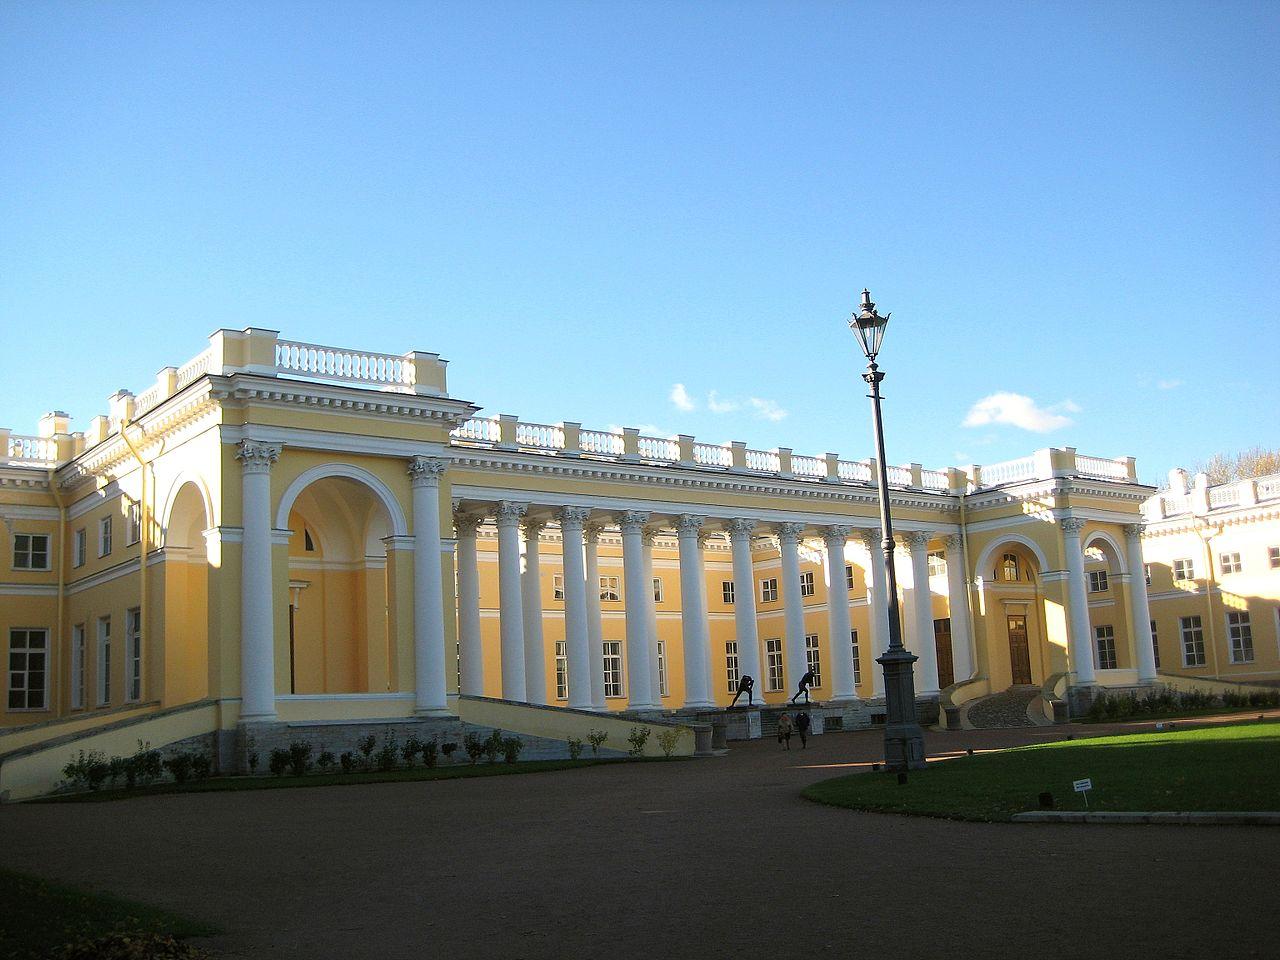 File:Pushkin (Tsarskoye Selo). Alexander Palace (Colonnade ...